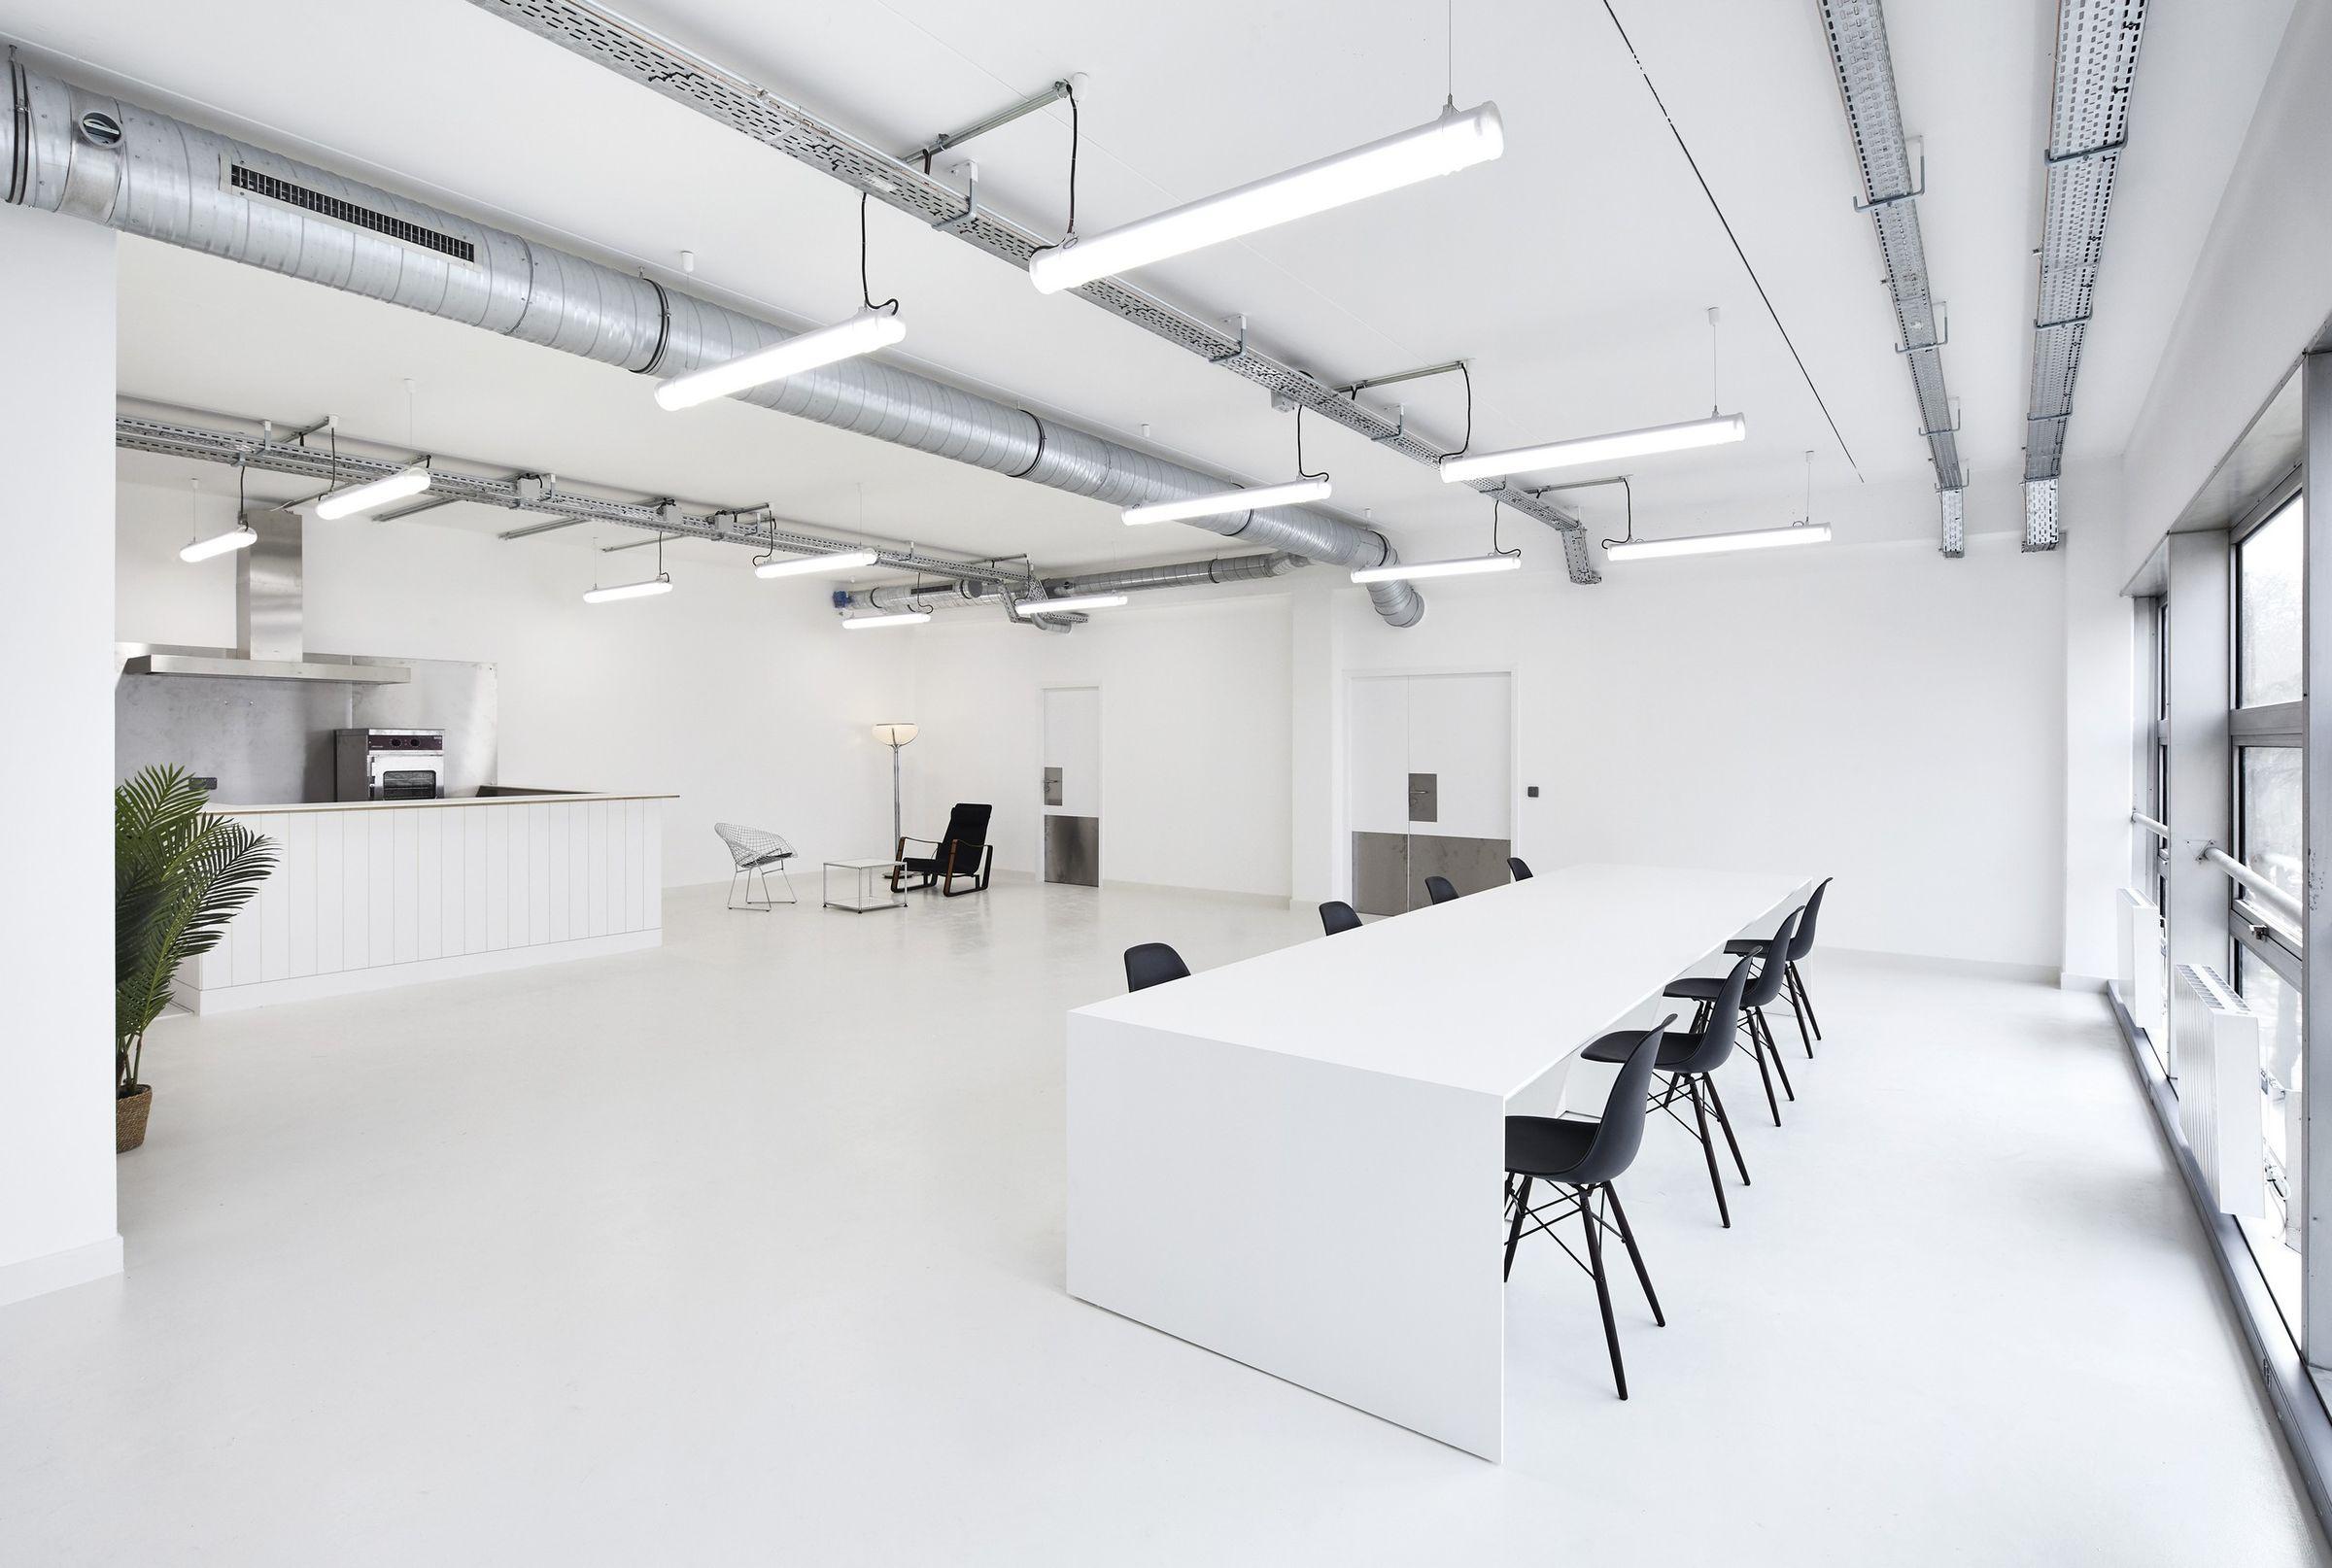 Ateliers Showroom Marine Serre Lemoal And Lemoal